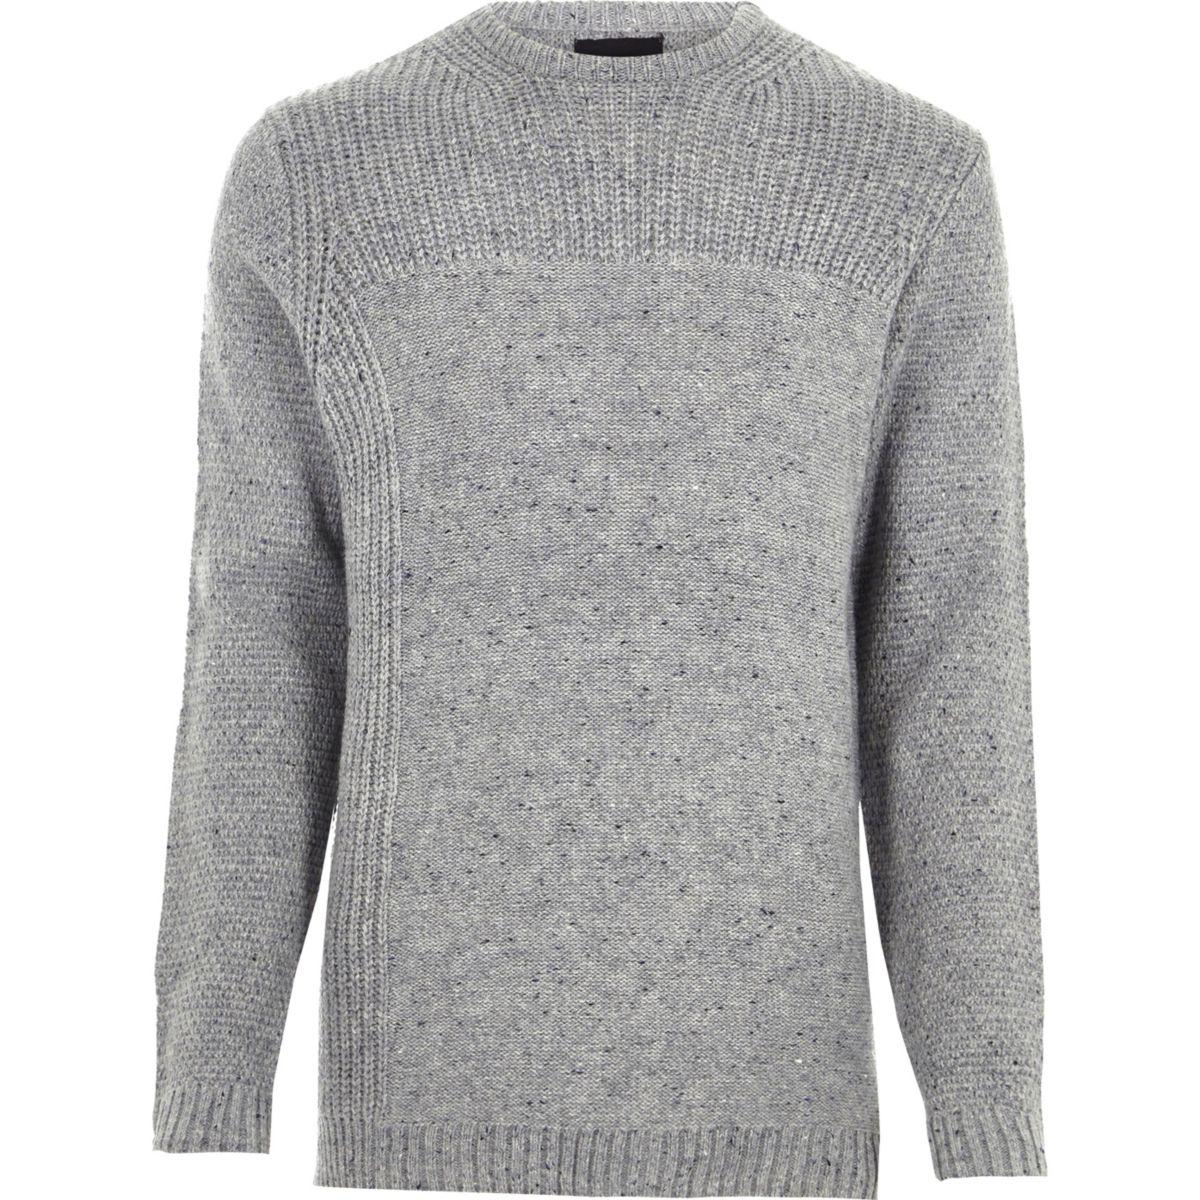 Grey mixed texture knit crew neck sweater